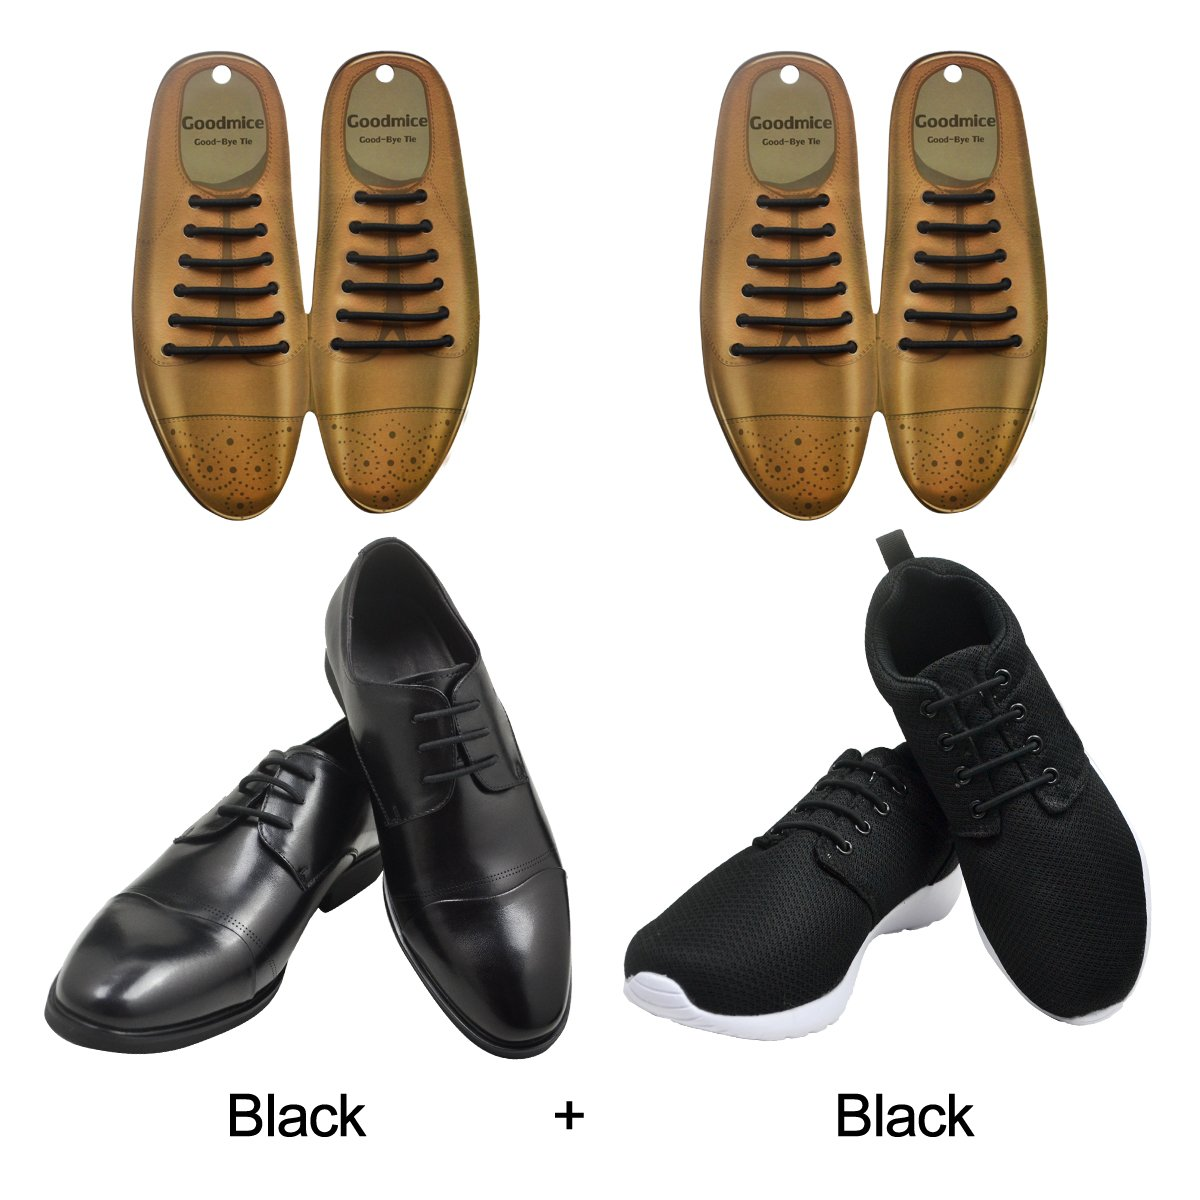 311e4f3bc91d0 SENT CHARM No Tie Dress Shoe Laces for Men/Women Elastic Rubber Silicone  Formal Oxford Shoelaces Best for Dress Shoes Oxford Shoes